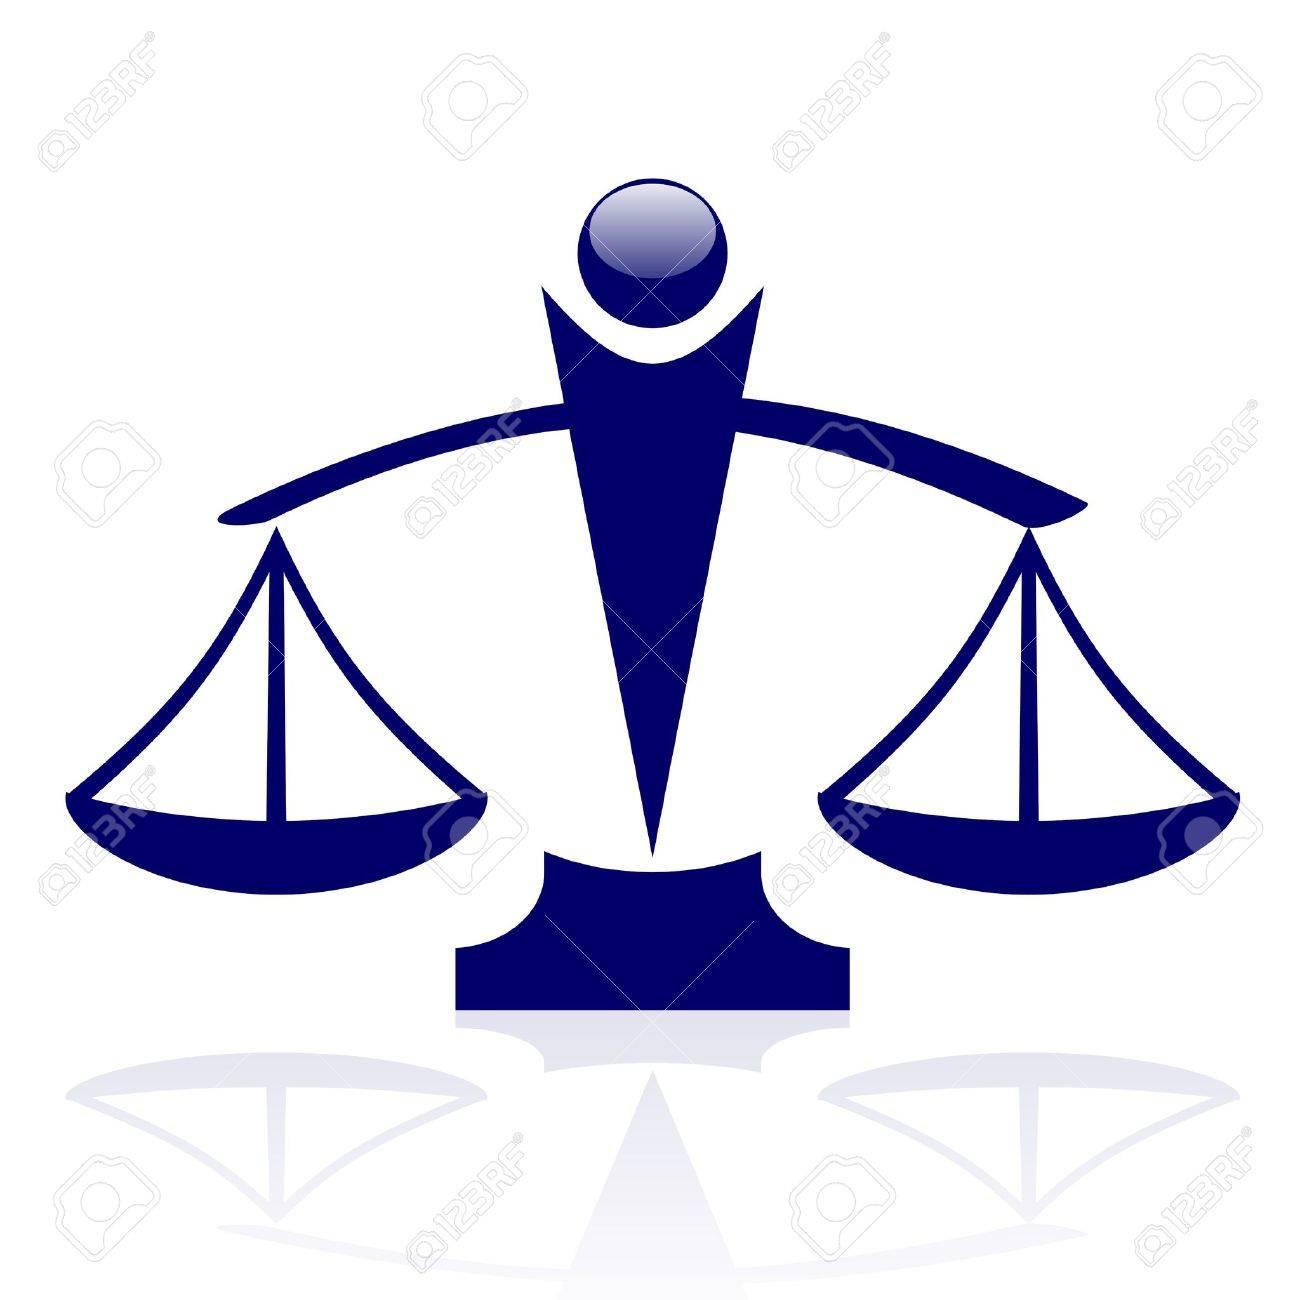 icon - Justice scales Stock Vector - 17688622